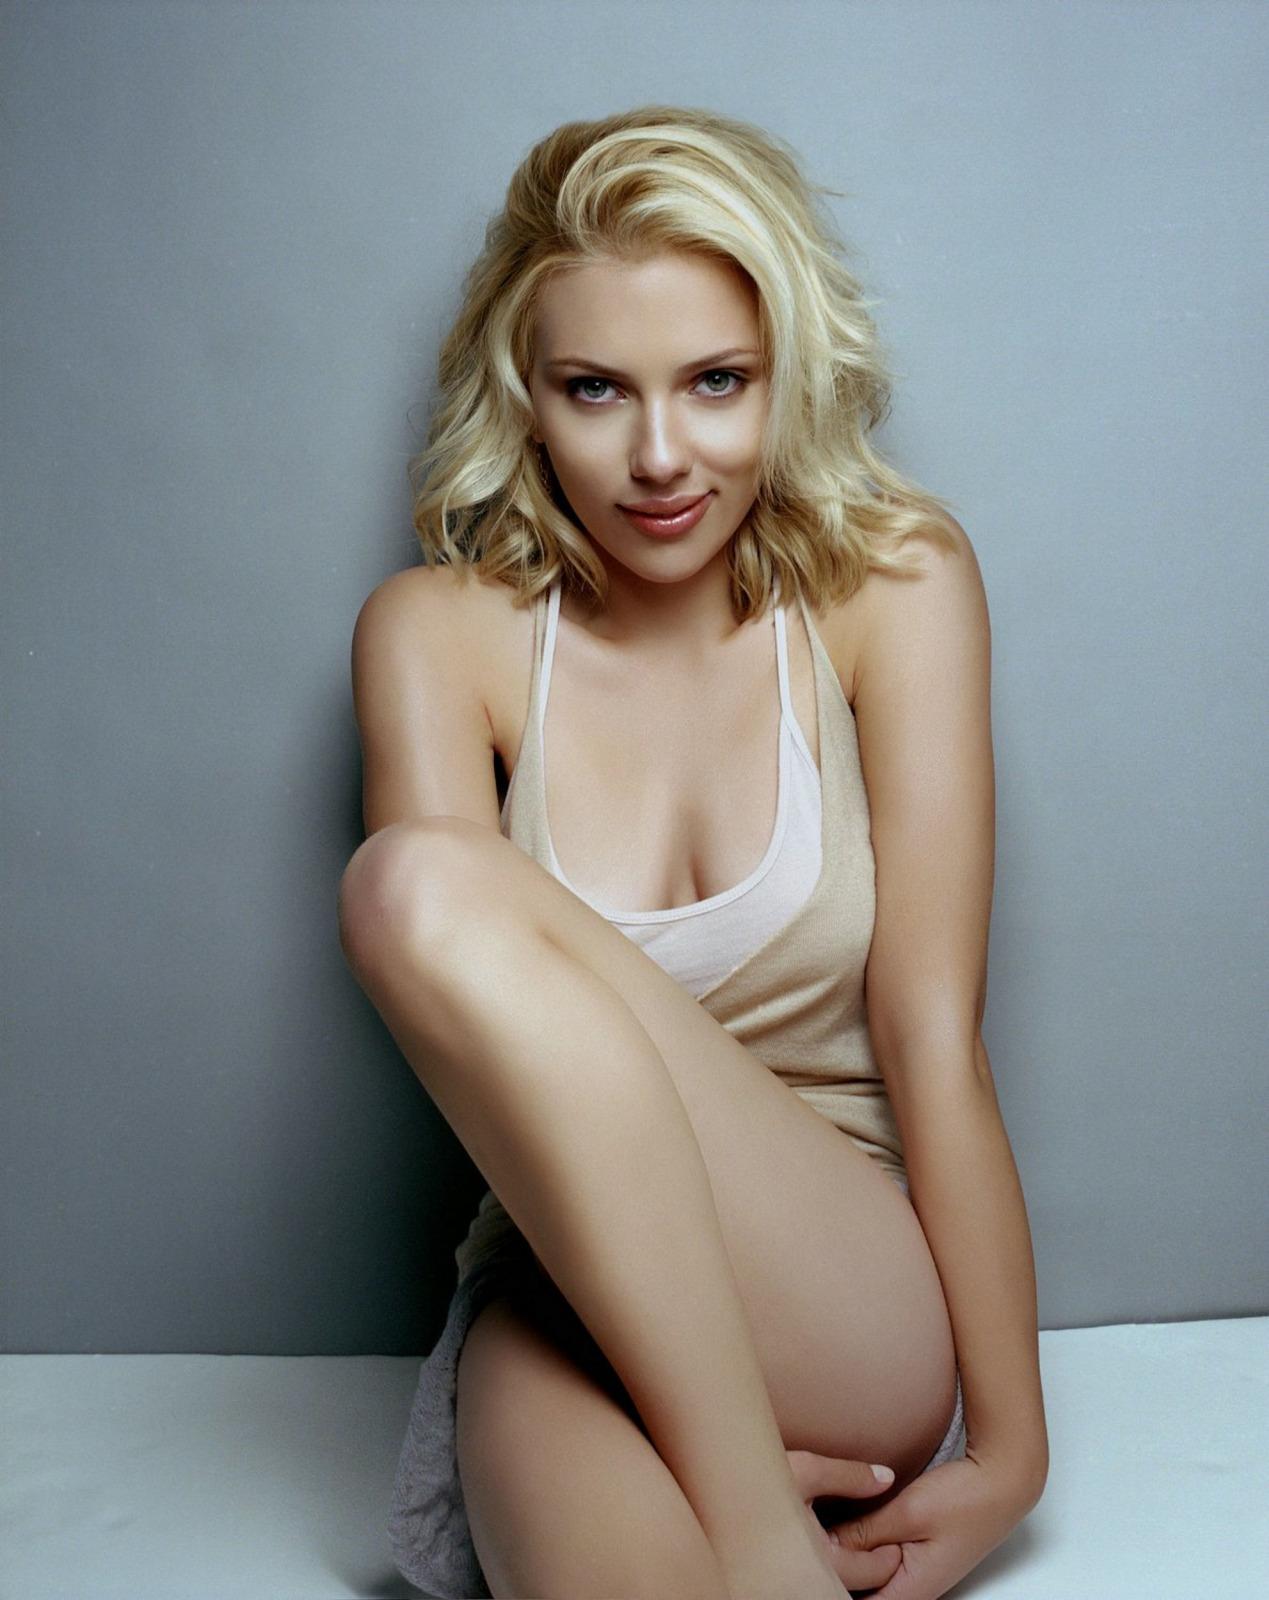 Scarlett Johansson C.W. Hot Photoshoot - Watch Latest ...